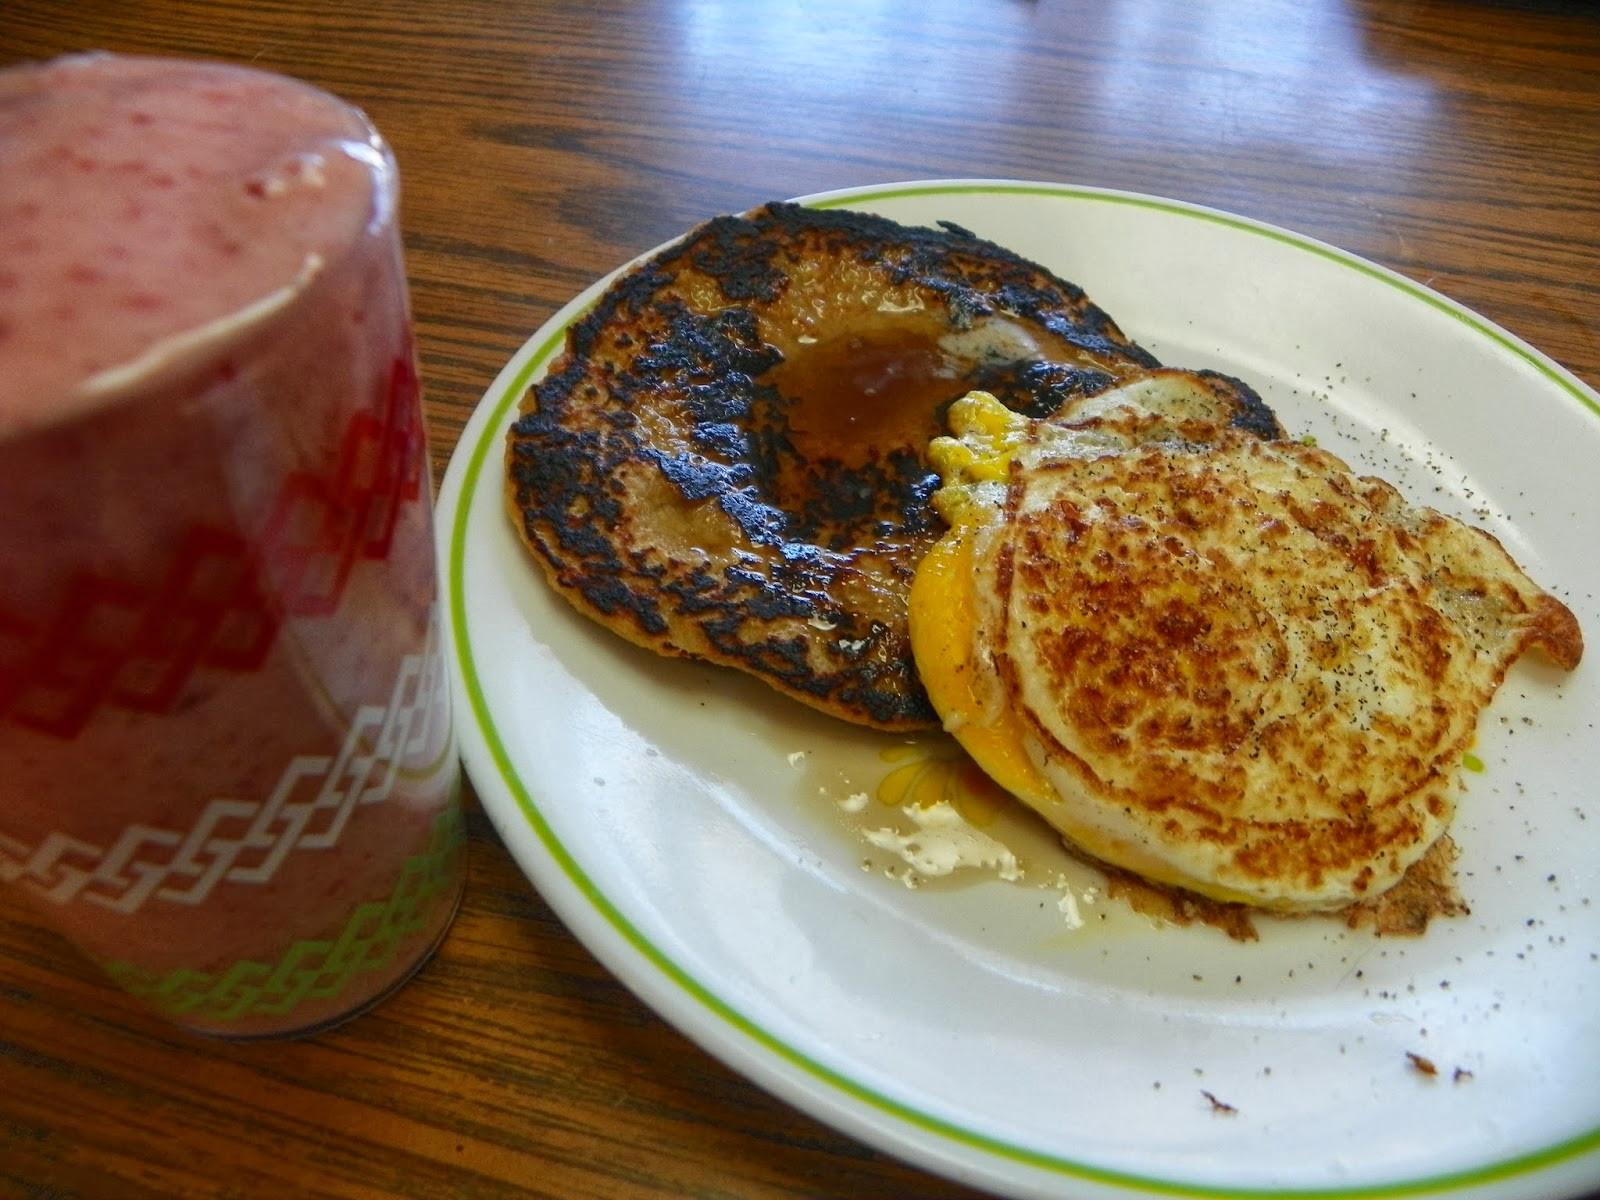 Healthy Light Breakfast  Dicky Bird s Nest Oatmeal Banana Pancake Light Healthy